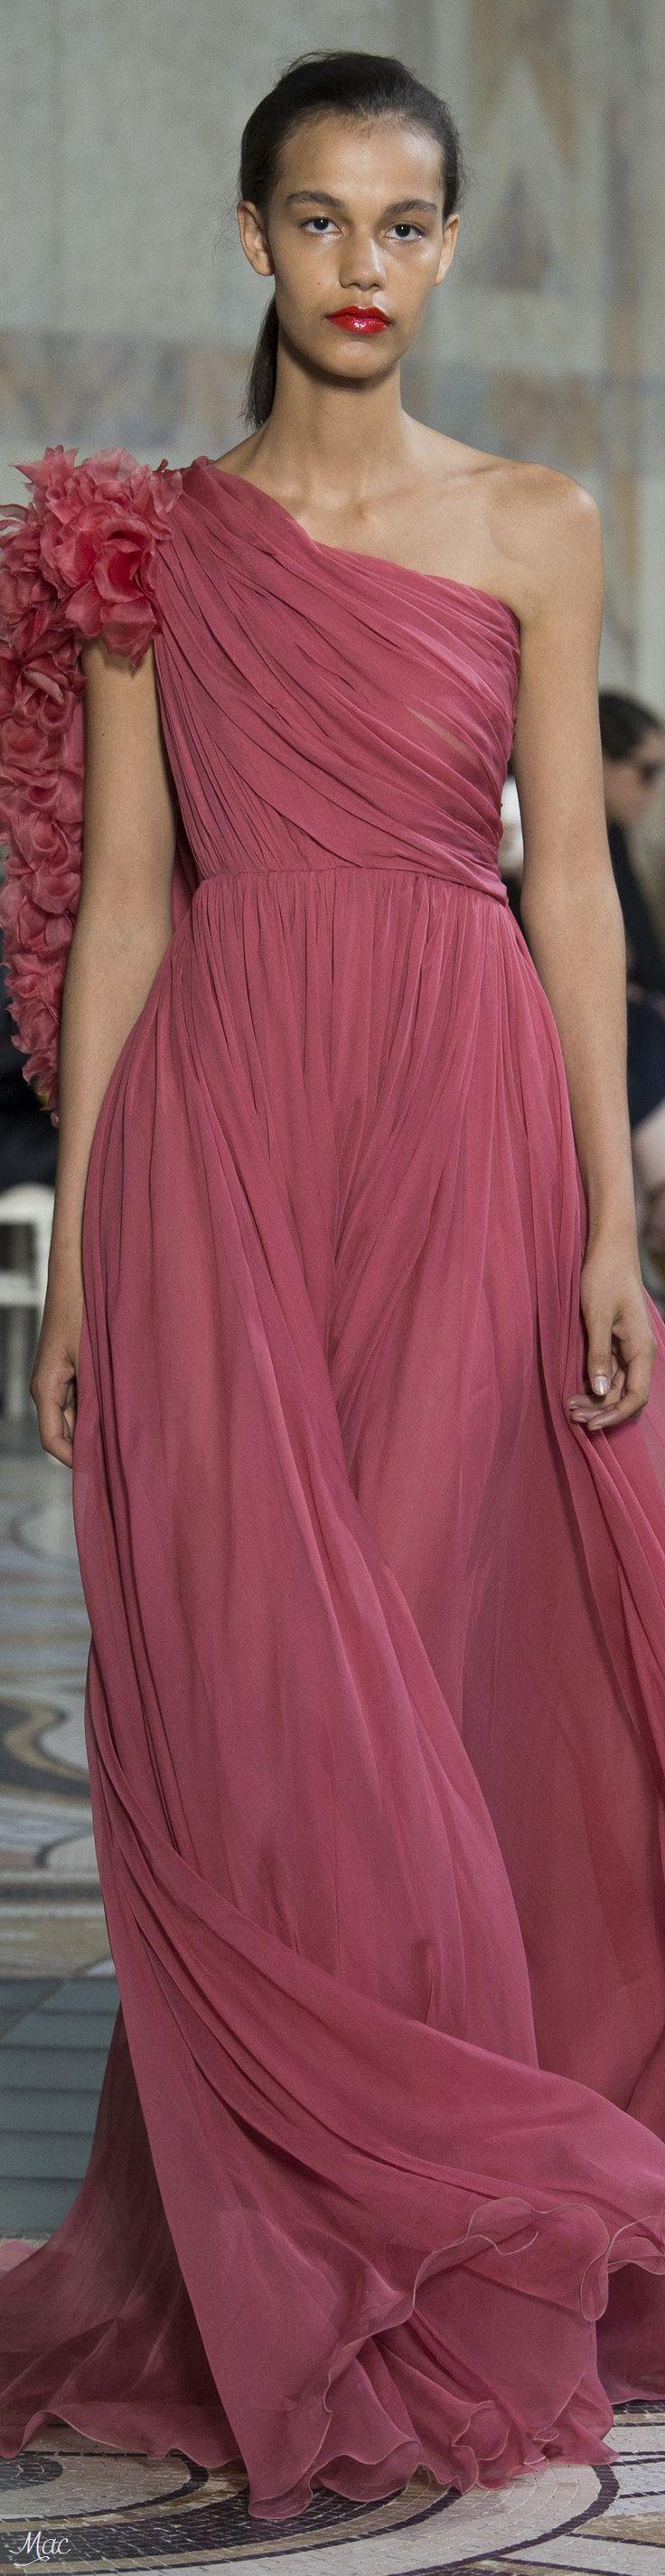 1376 mejores imágenes de Haute Couture en Pinterest | Alta costura ...